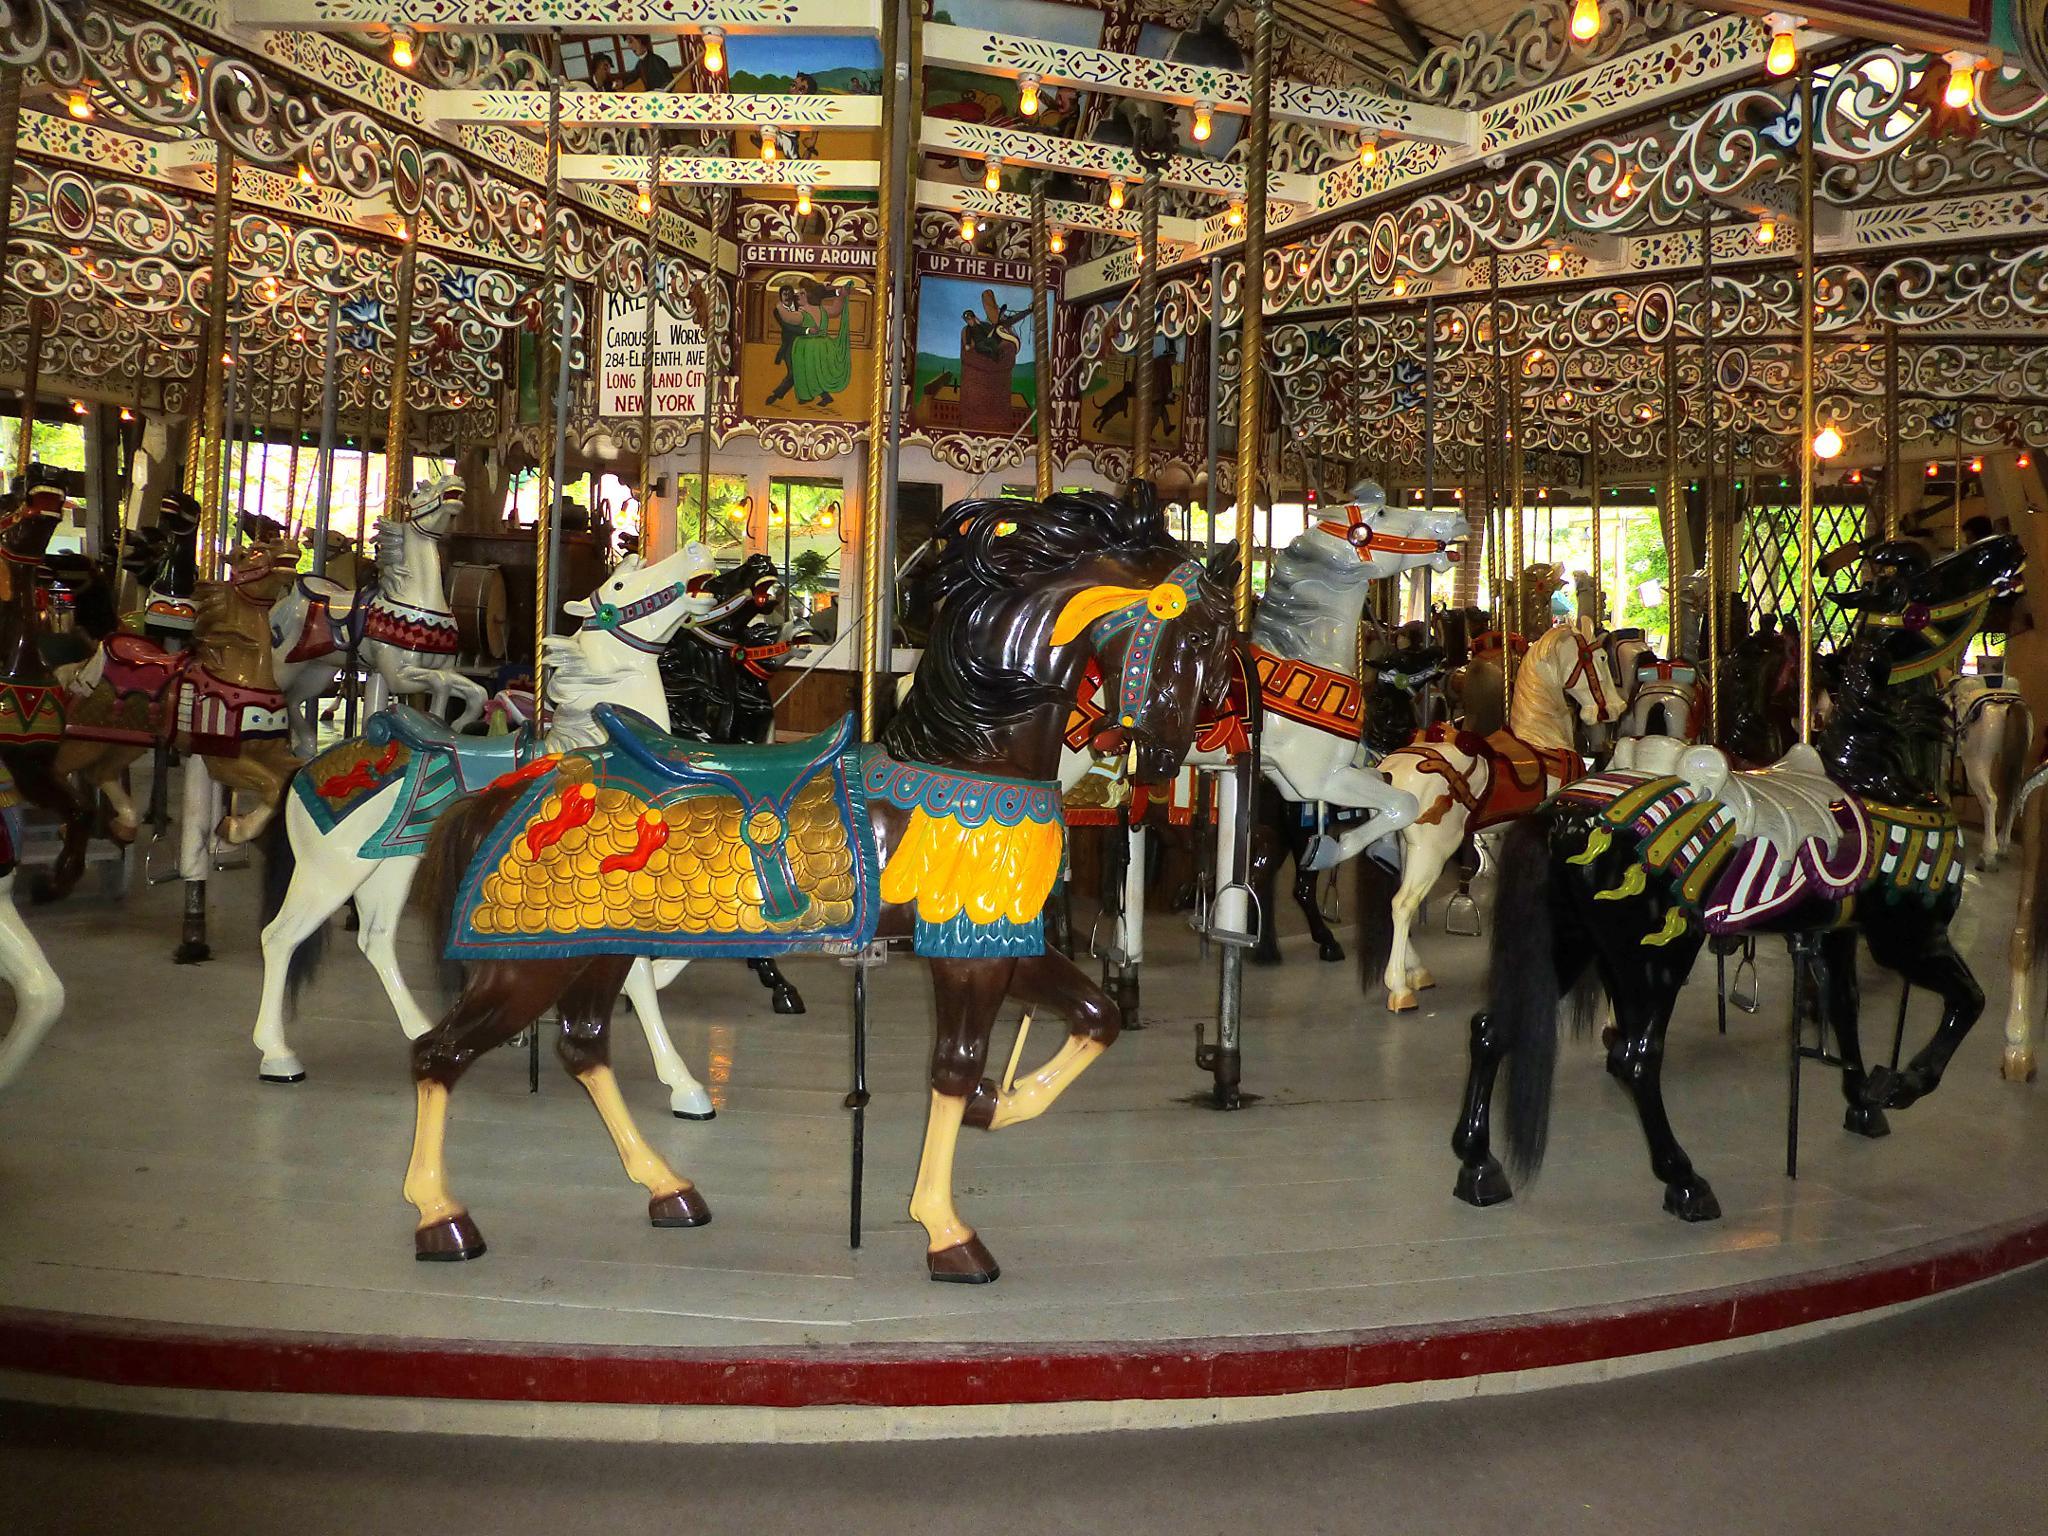 Carousel Horses II by Terri Scache Harris